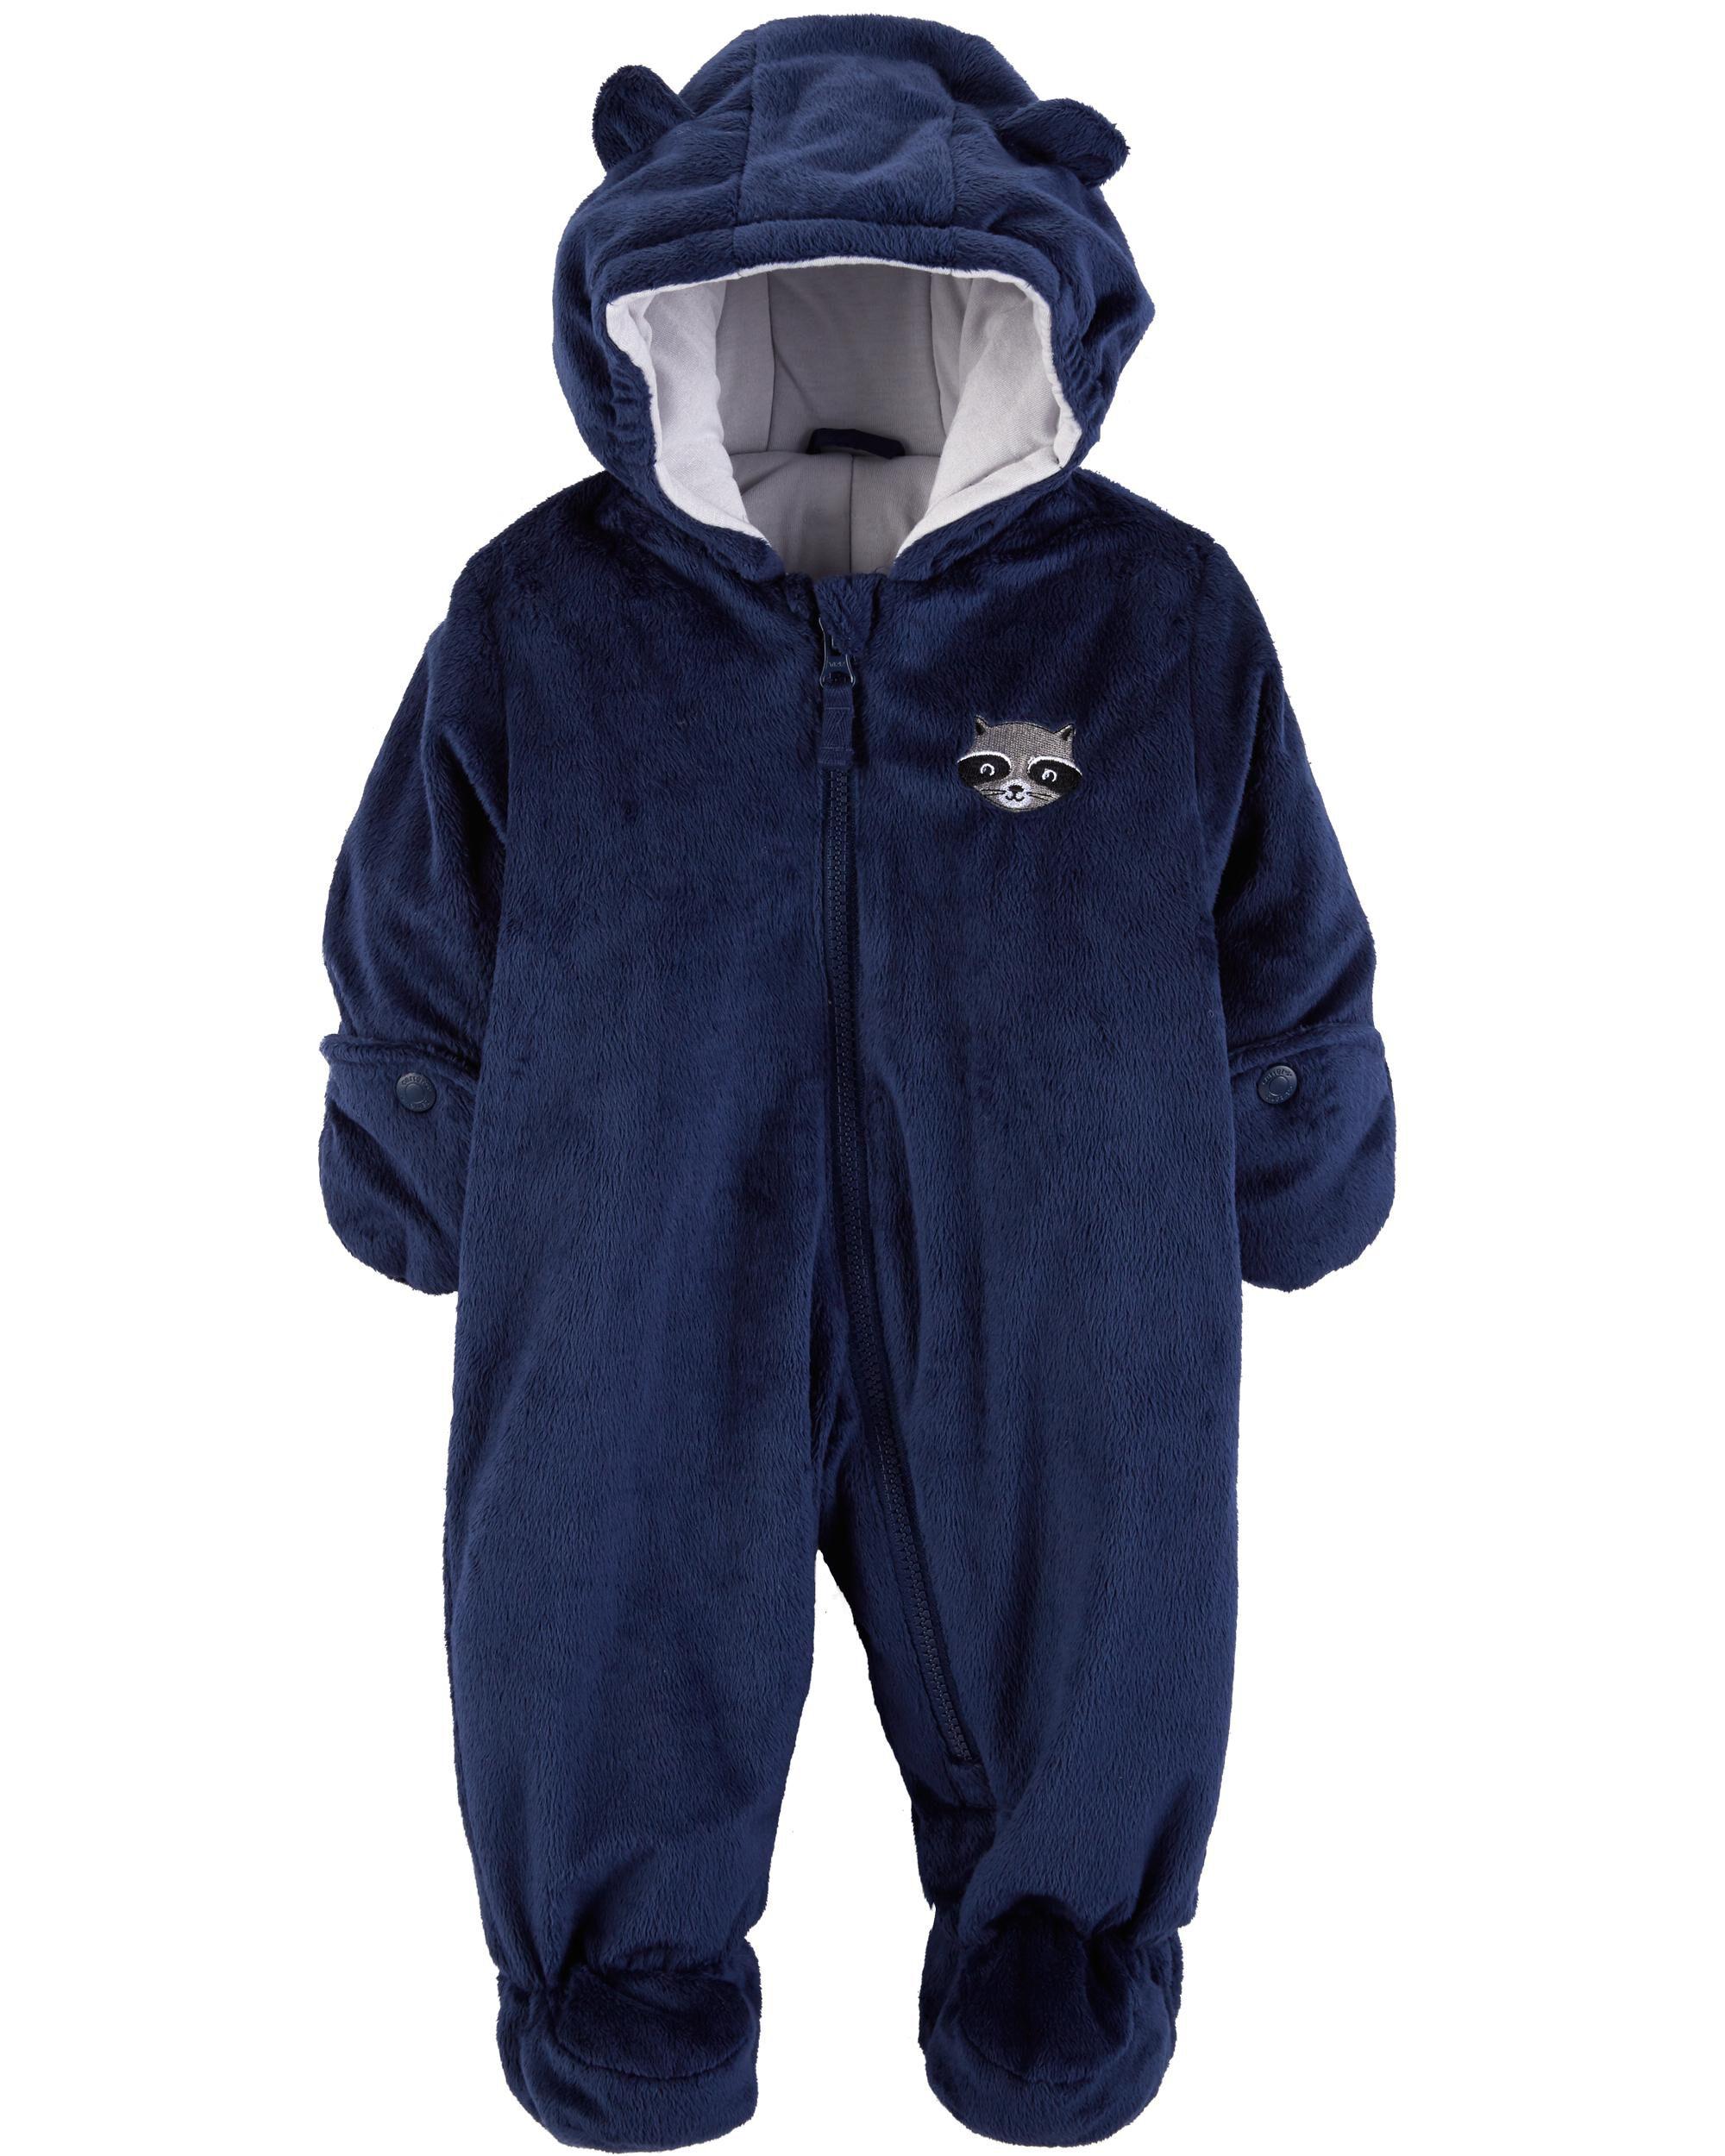 5536e1e6c Raccoon Fuzzy Pram Suit